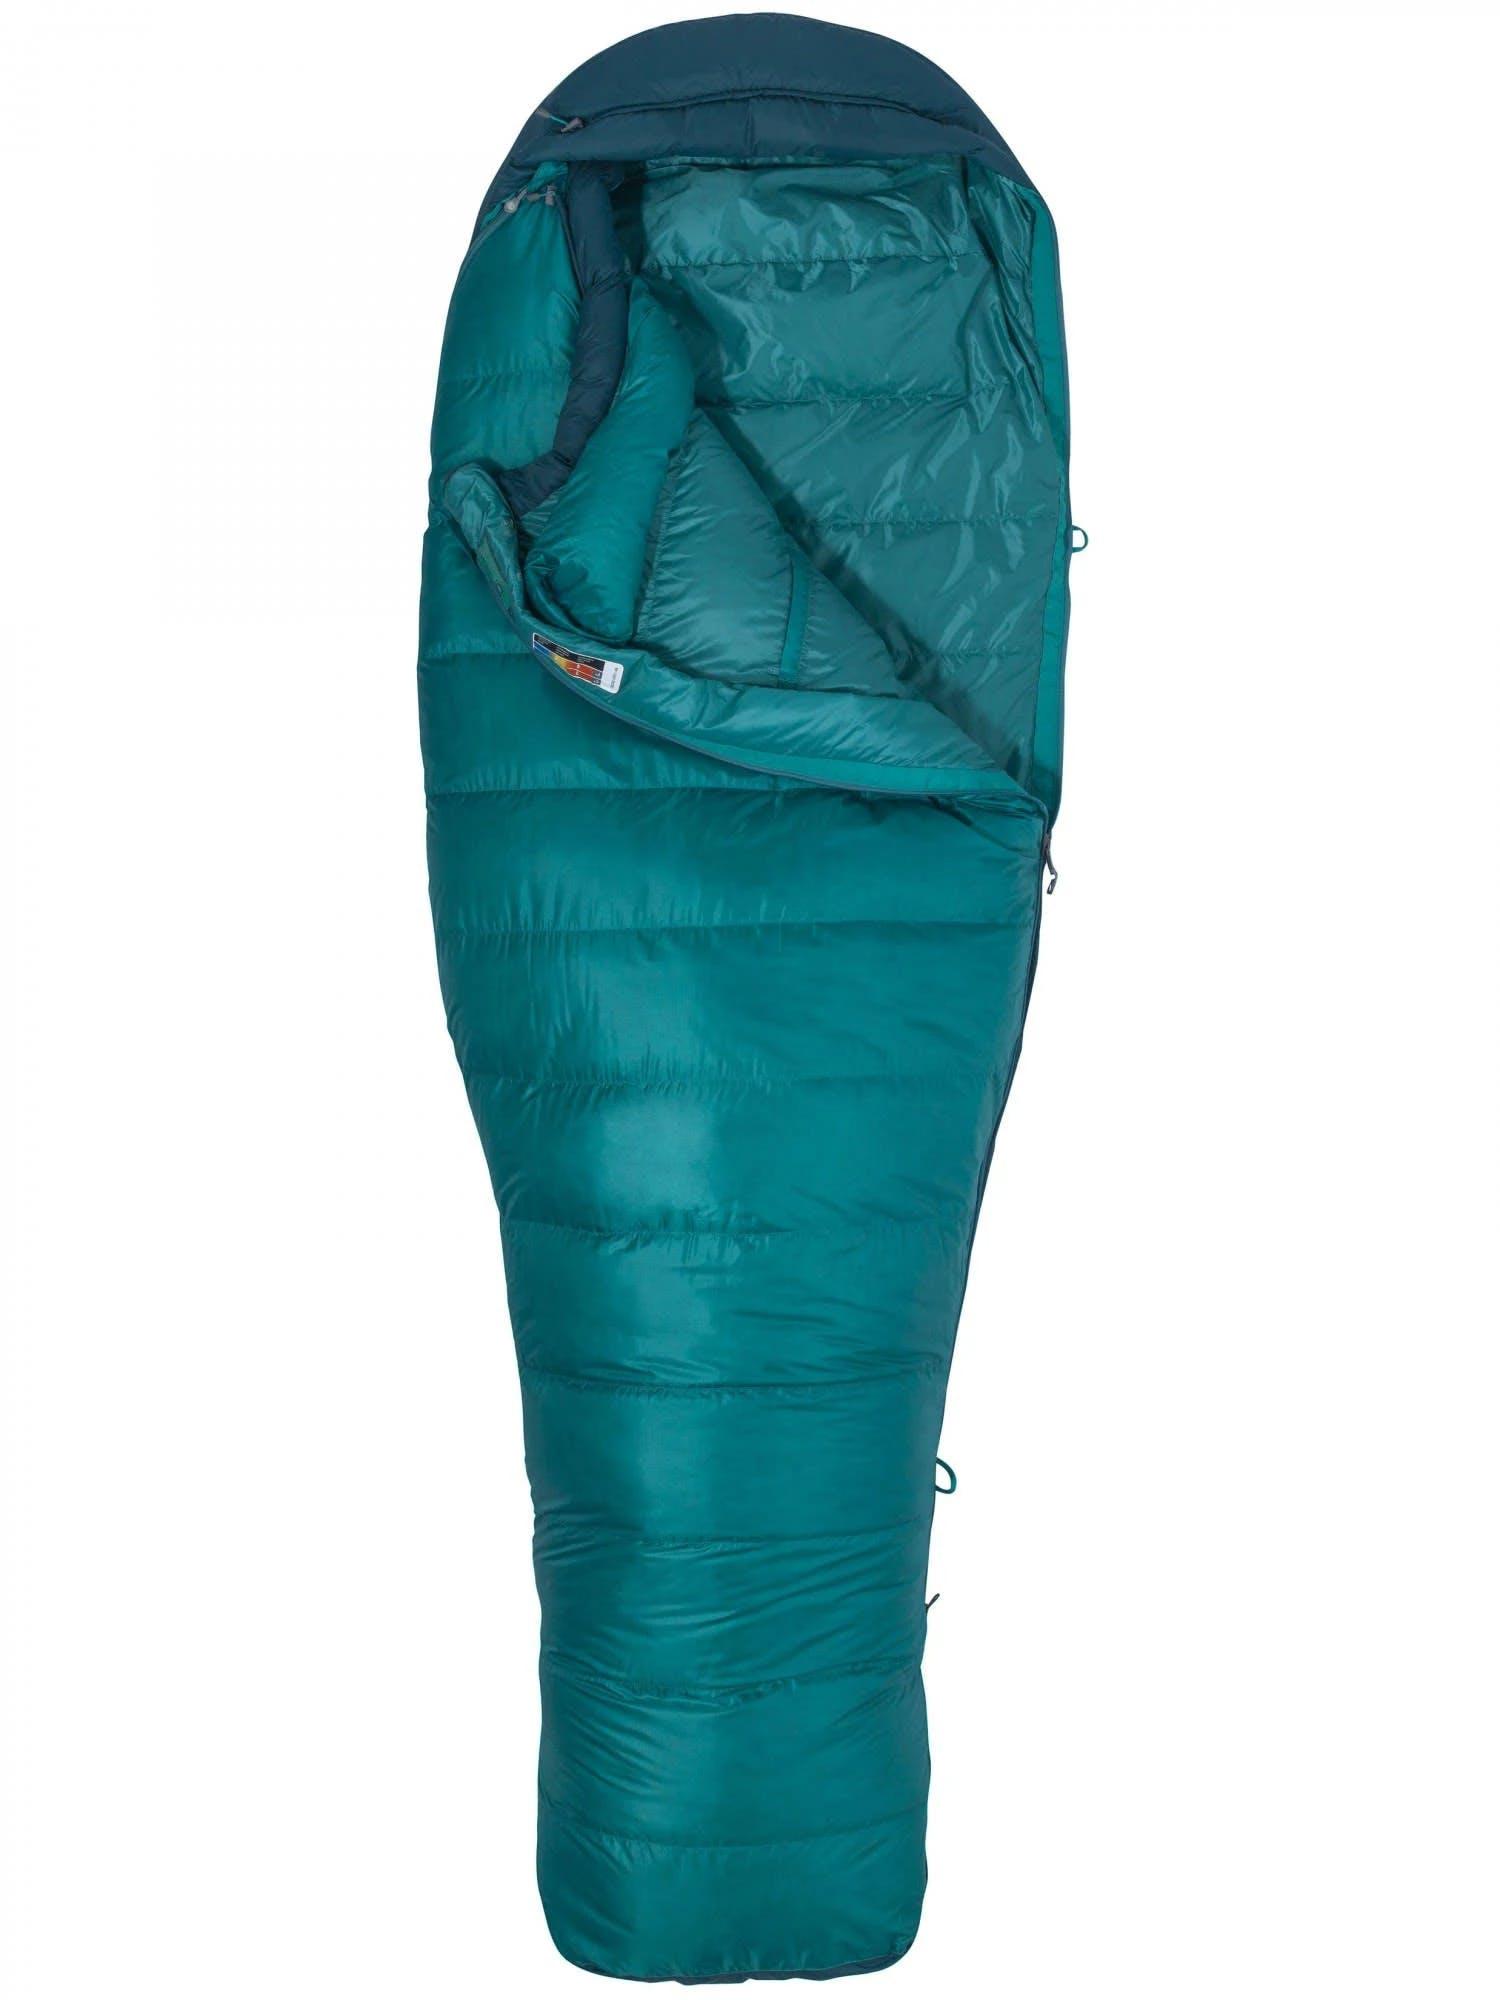 Marmot Angel Fire Sleeping Bag - Women's Malachite/Deep Teal